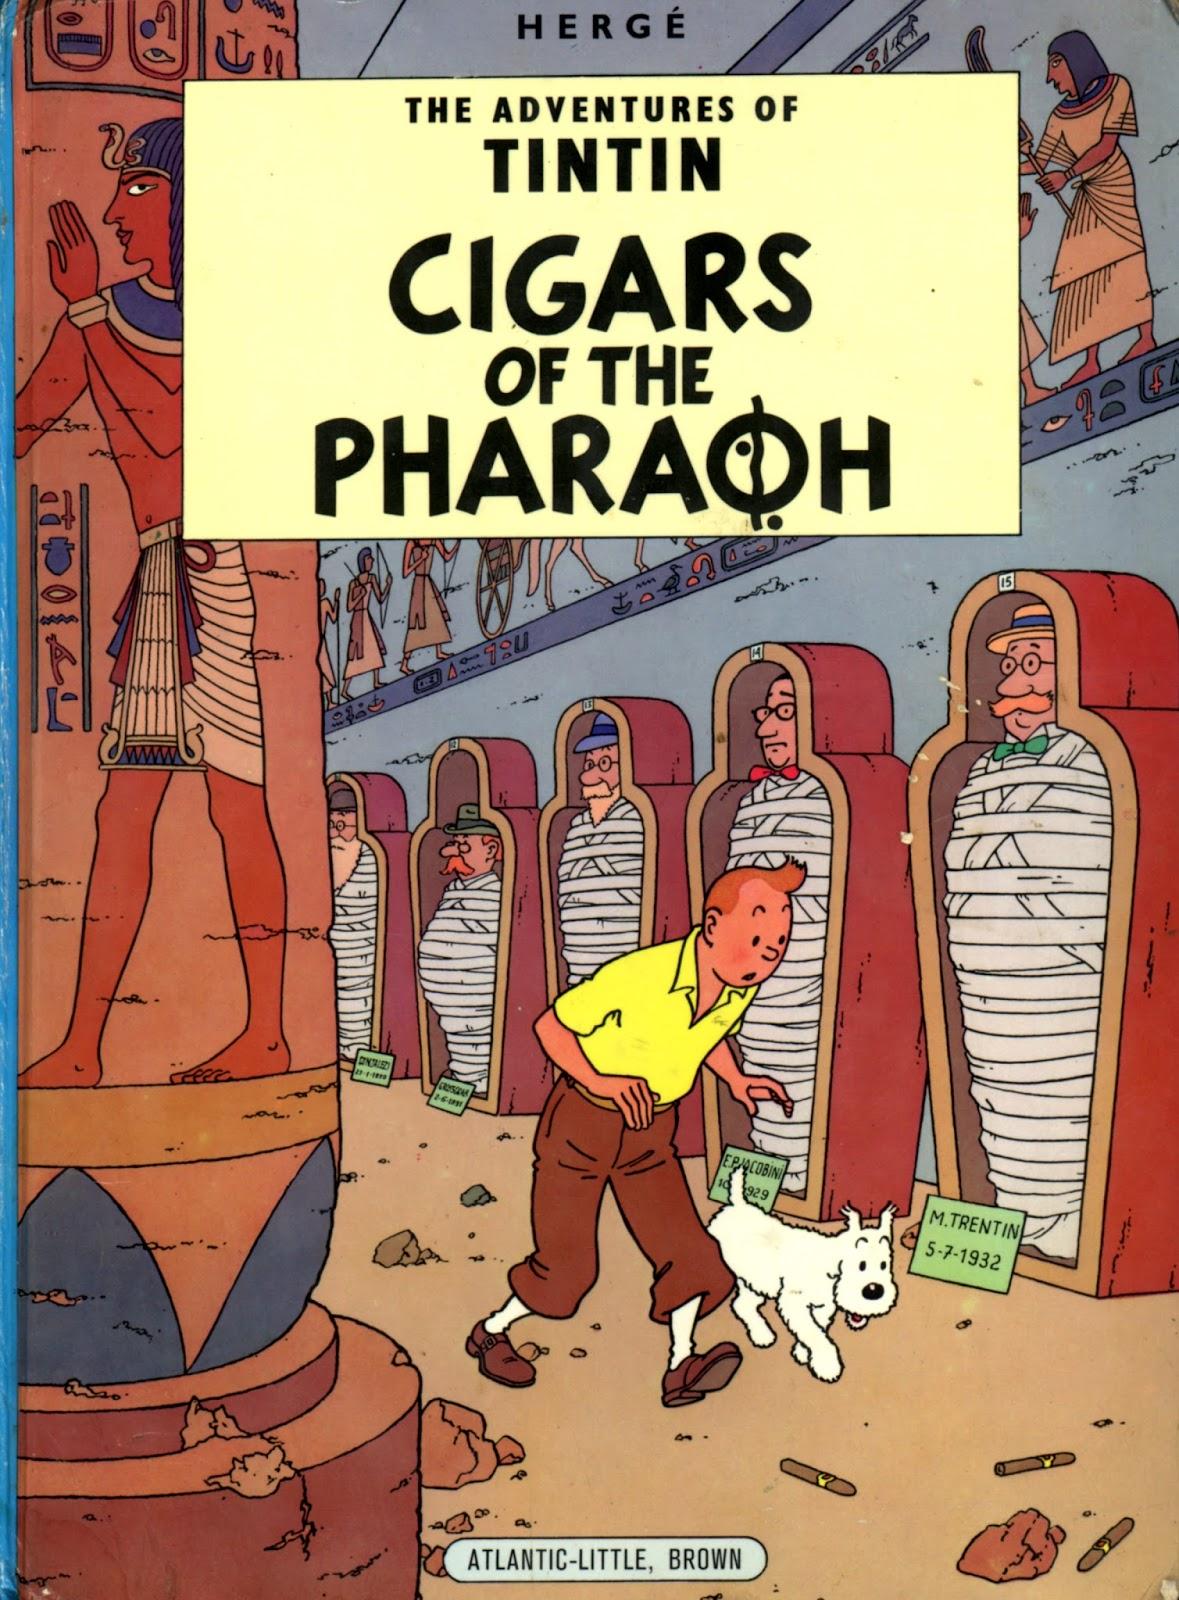 Tintin Comics  Cigars Of The Pharaoh Free Pdf  Free